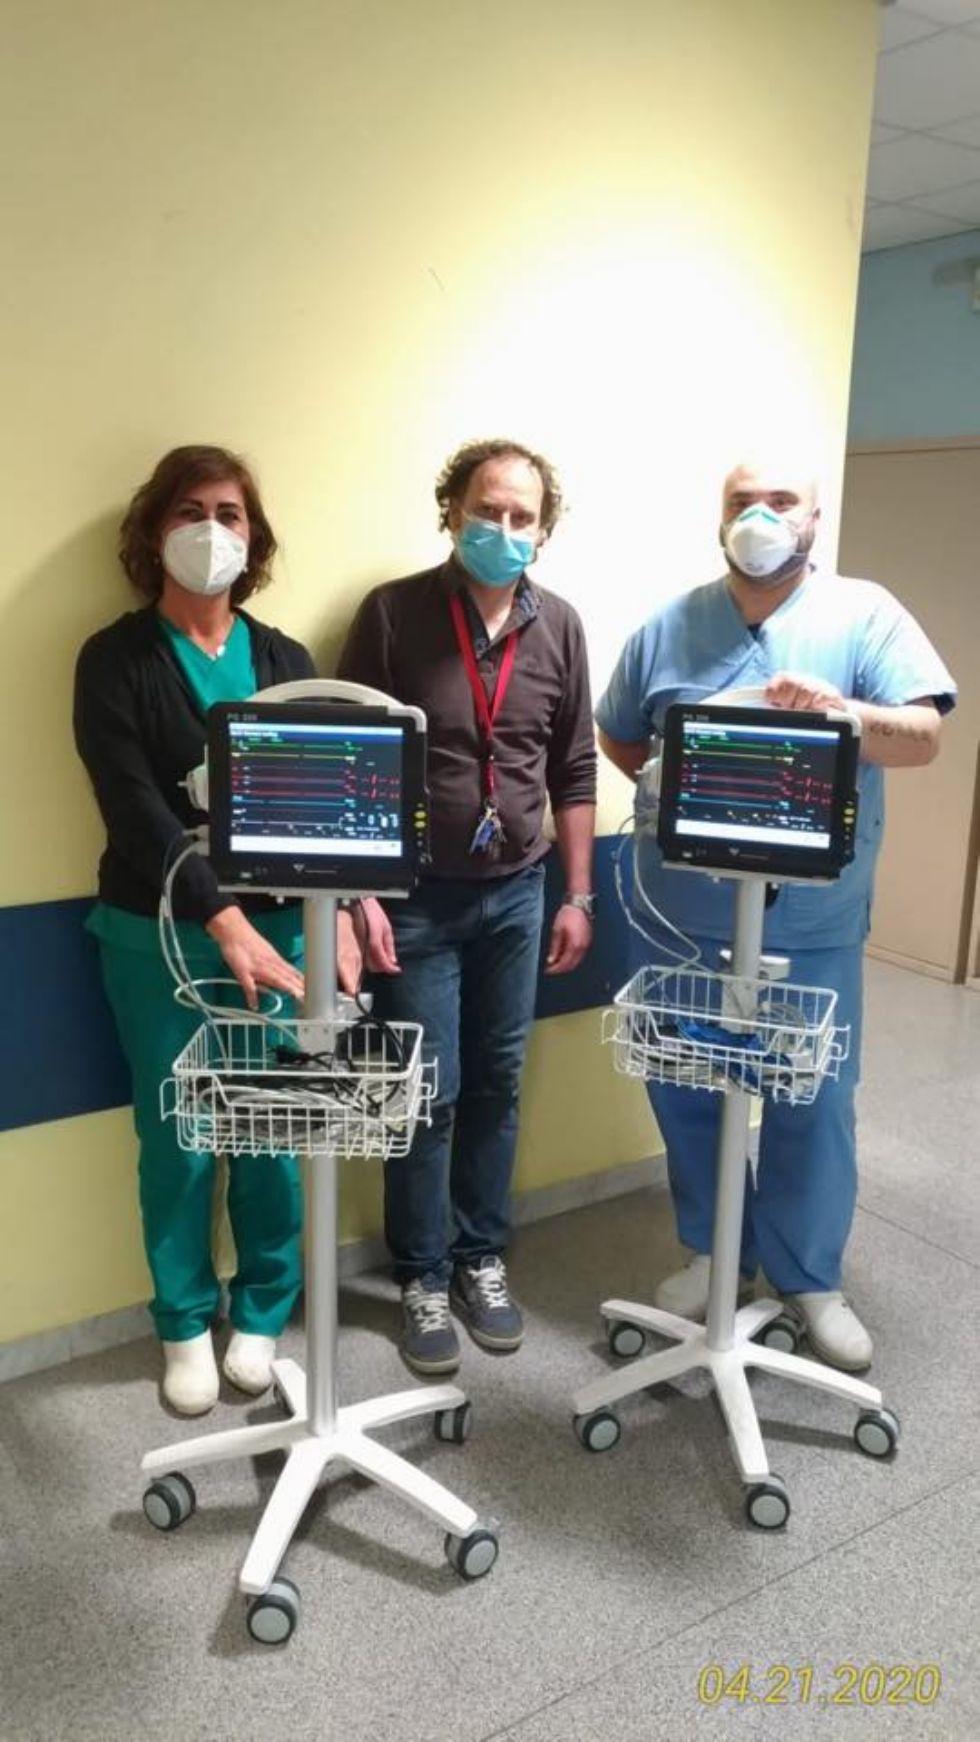 RIVOLI - La Azimut Capital Management dona due monitor multiparametrici al pronto soccorso